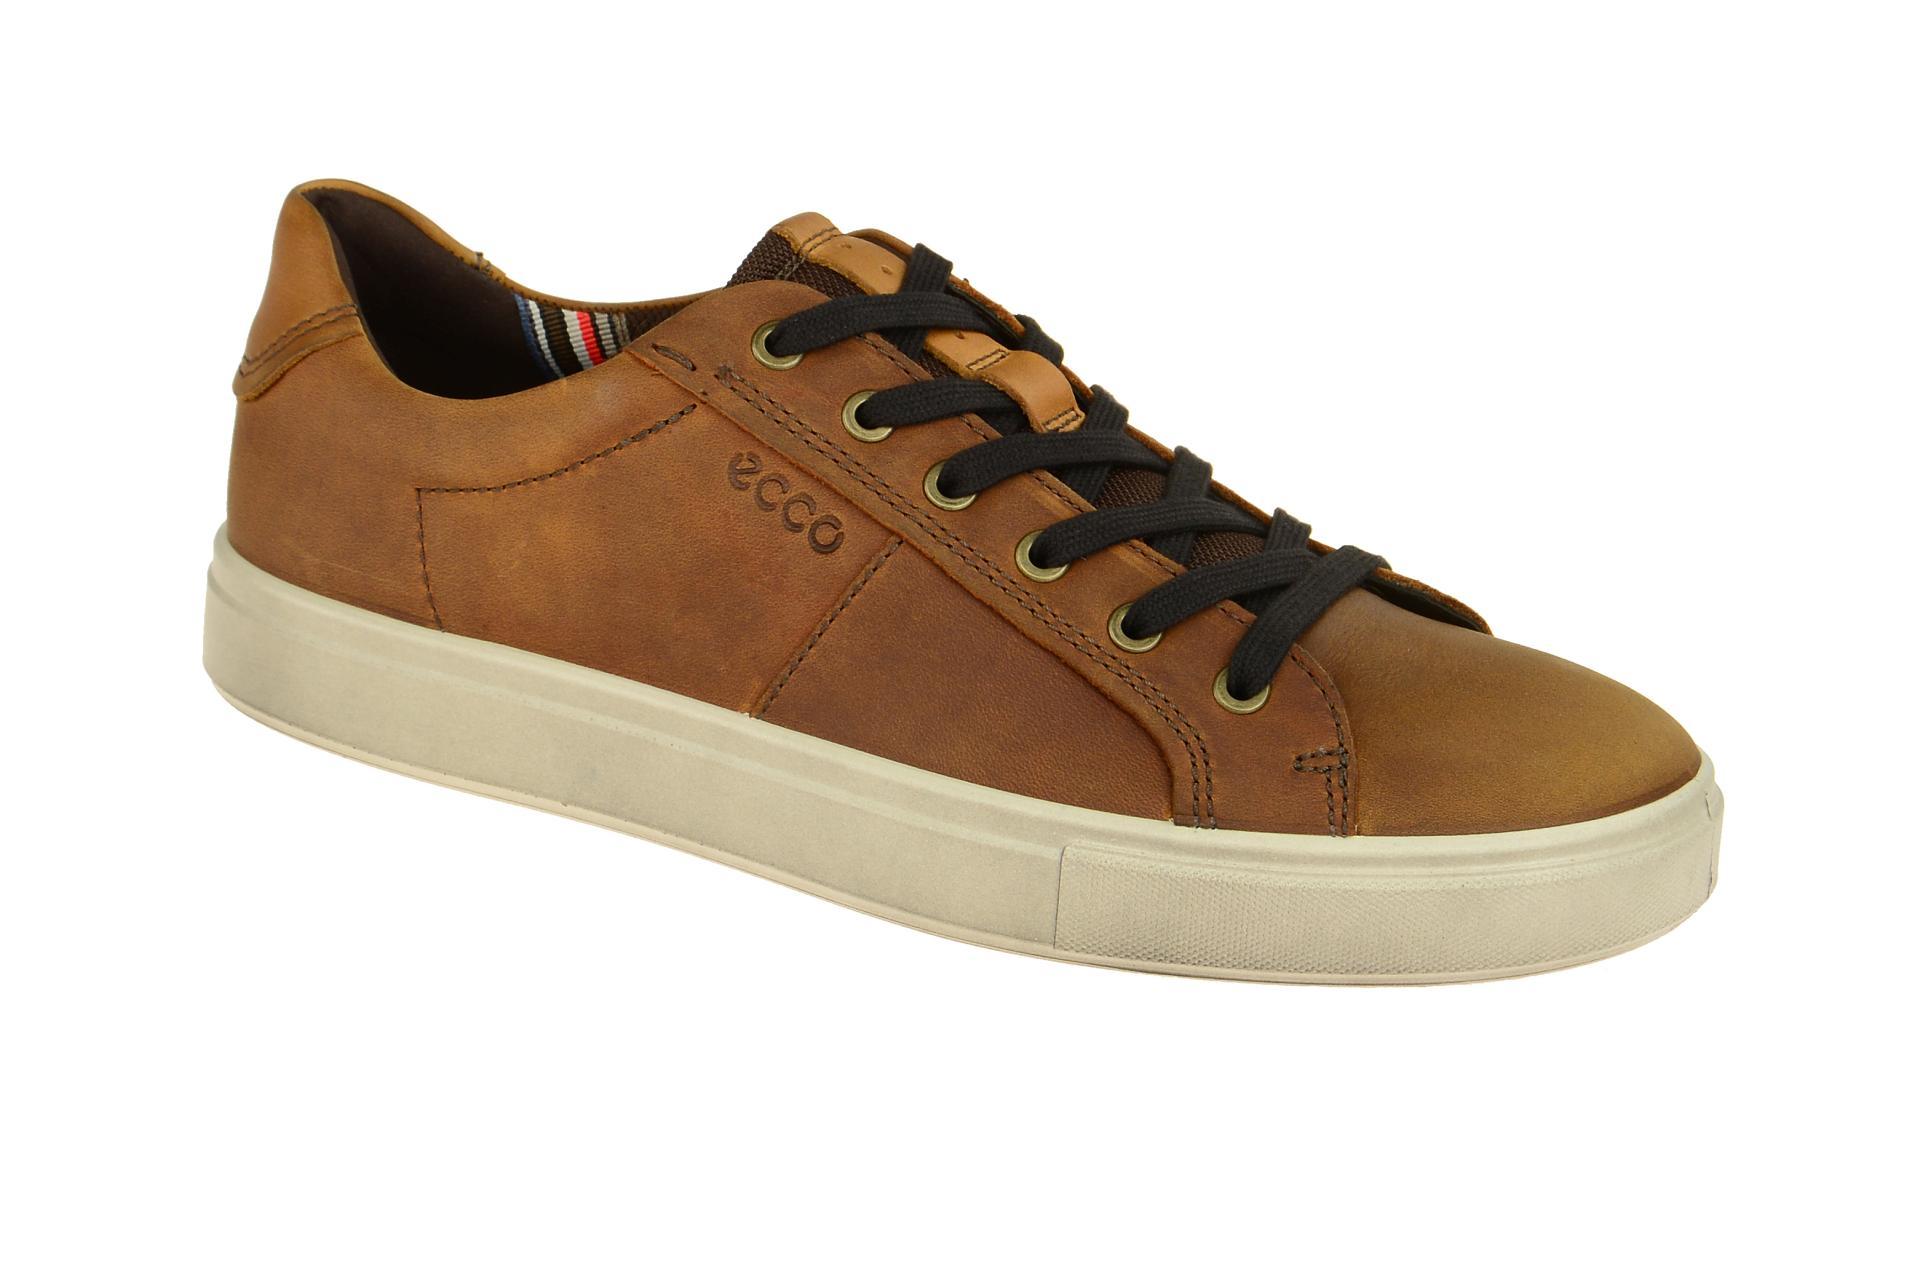 1f787b5e95236f Ecco Kyle Schuhe Sneakers hell-braun - Schuhhaus Strauch Shop